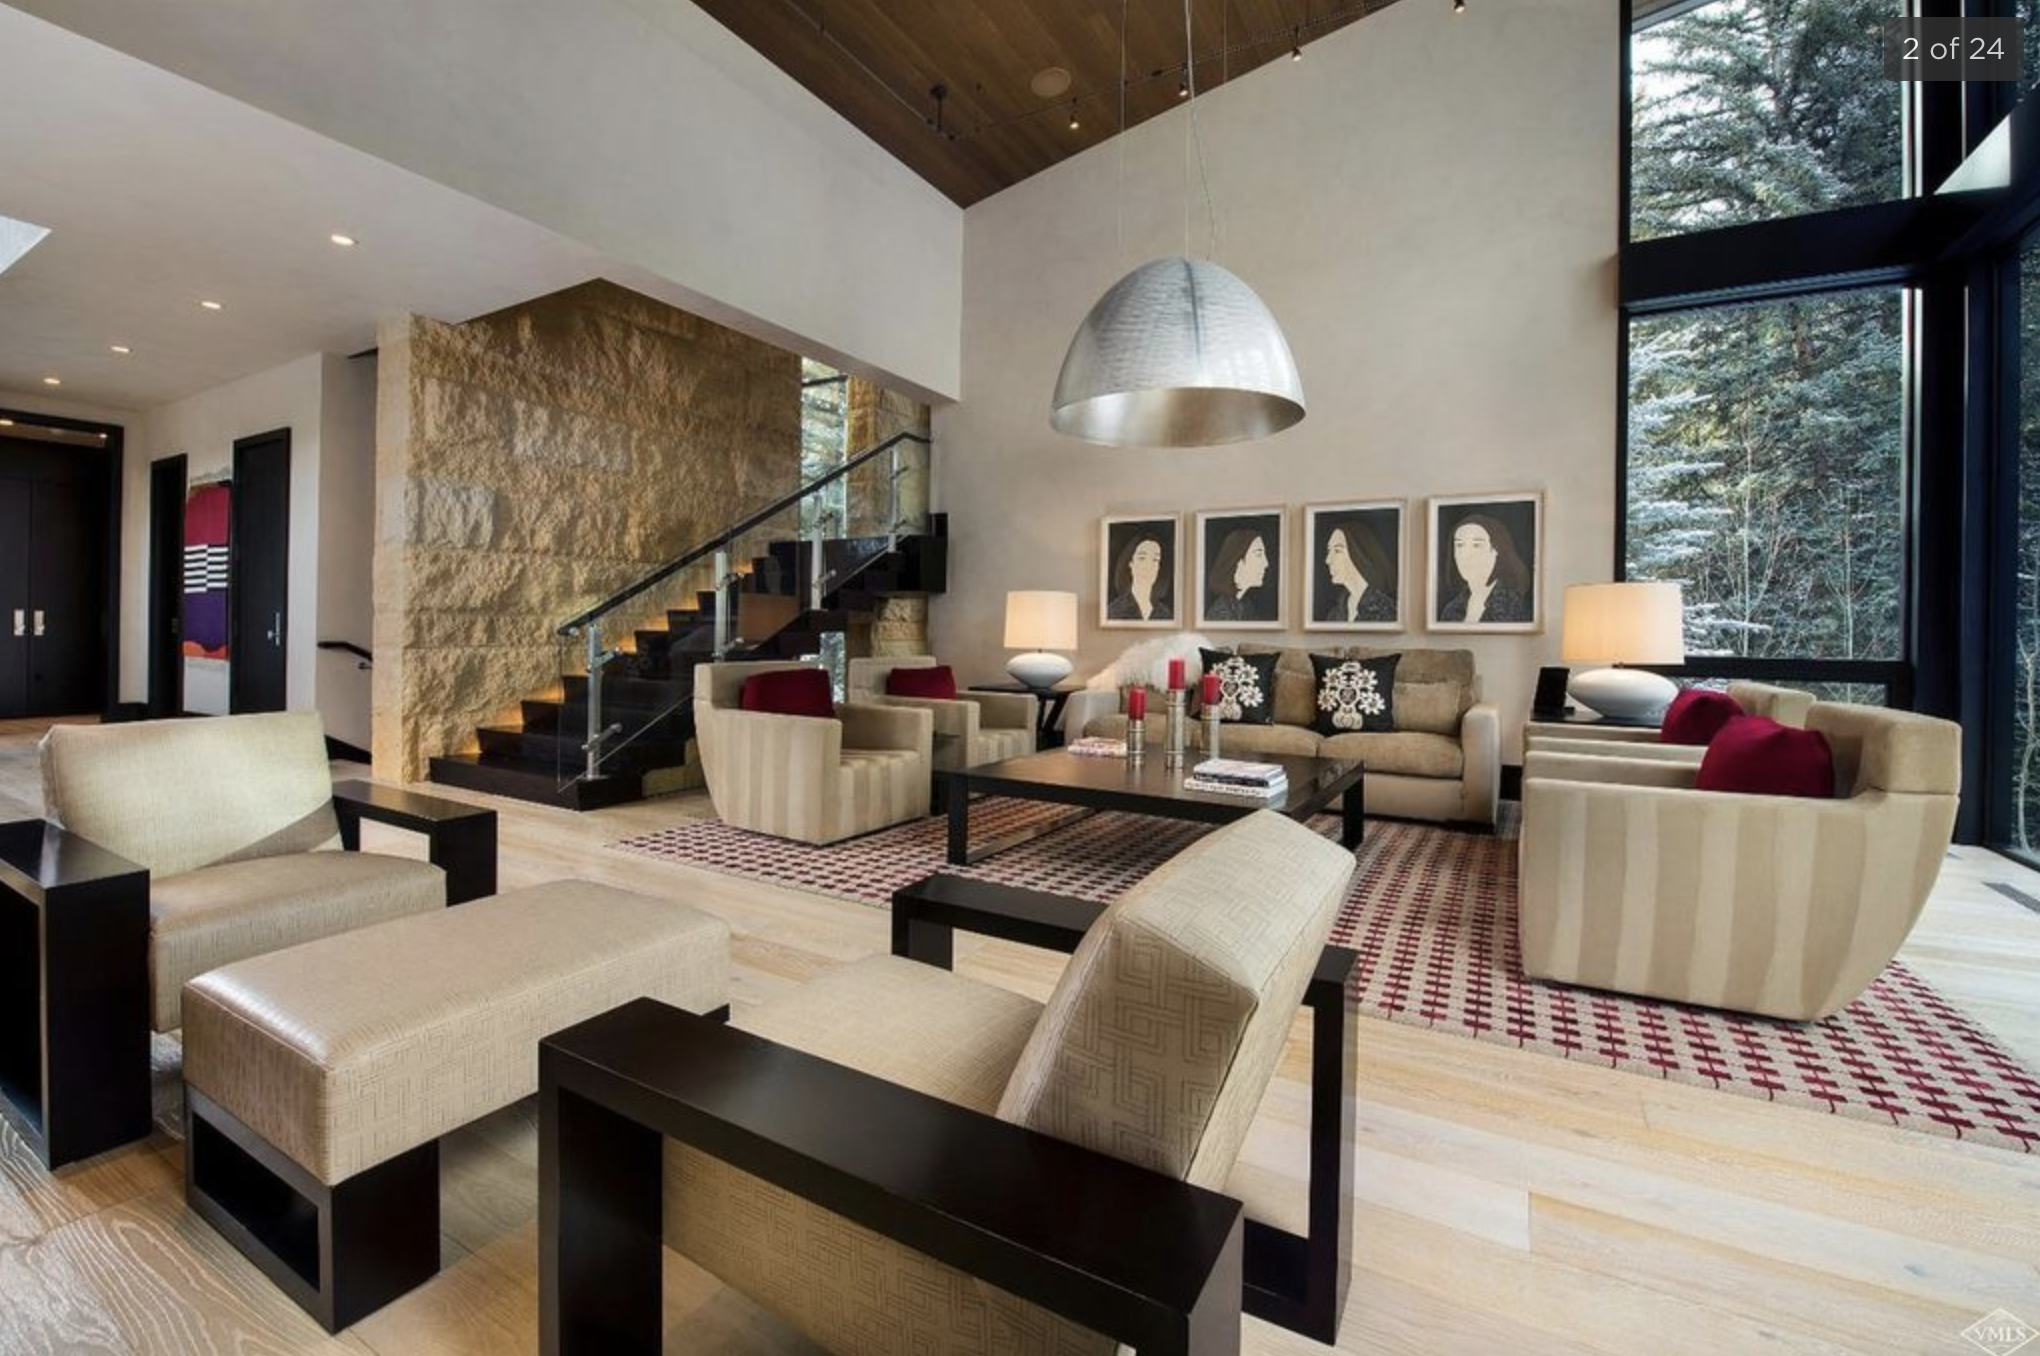 Home Decorappy Good Interior Designs Cool Ideas Best Free Design  Websitesbest Websites 2016best